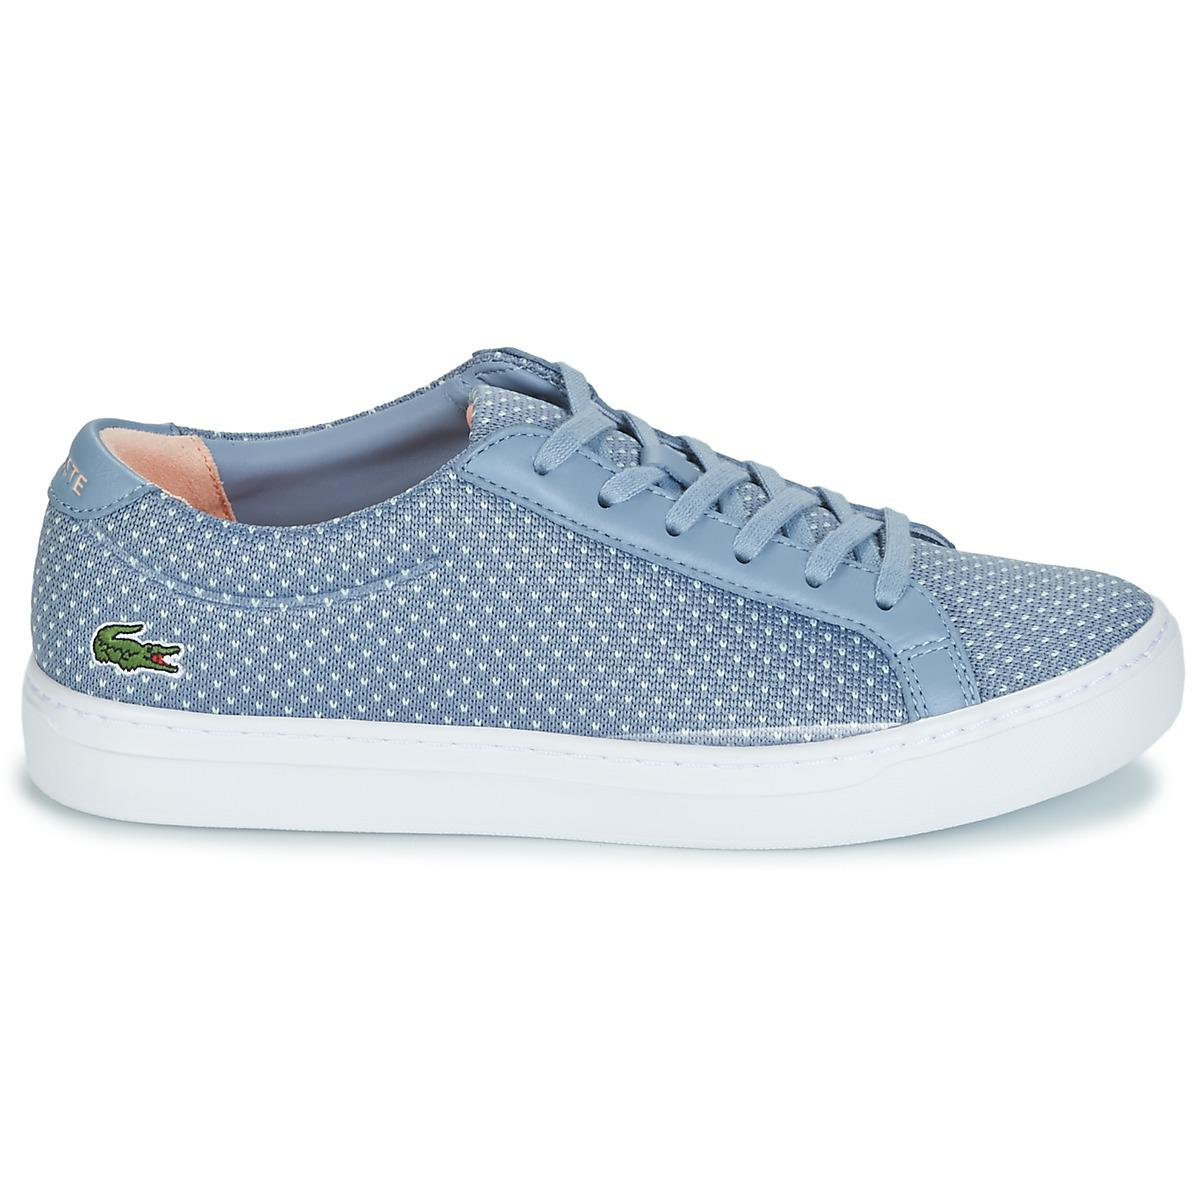 Bleu 12 L En Lacoste Chaussures Coloris Femmes 12 Lightweight1181 zSUGVqMp